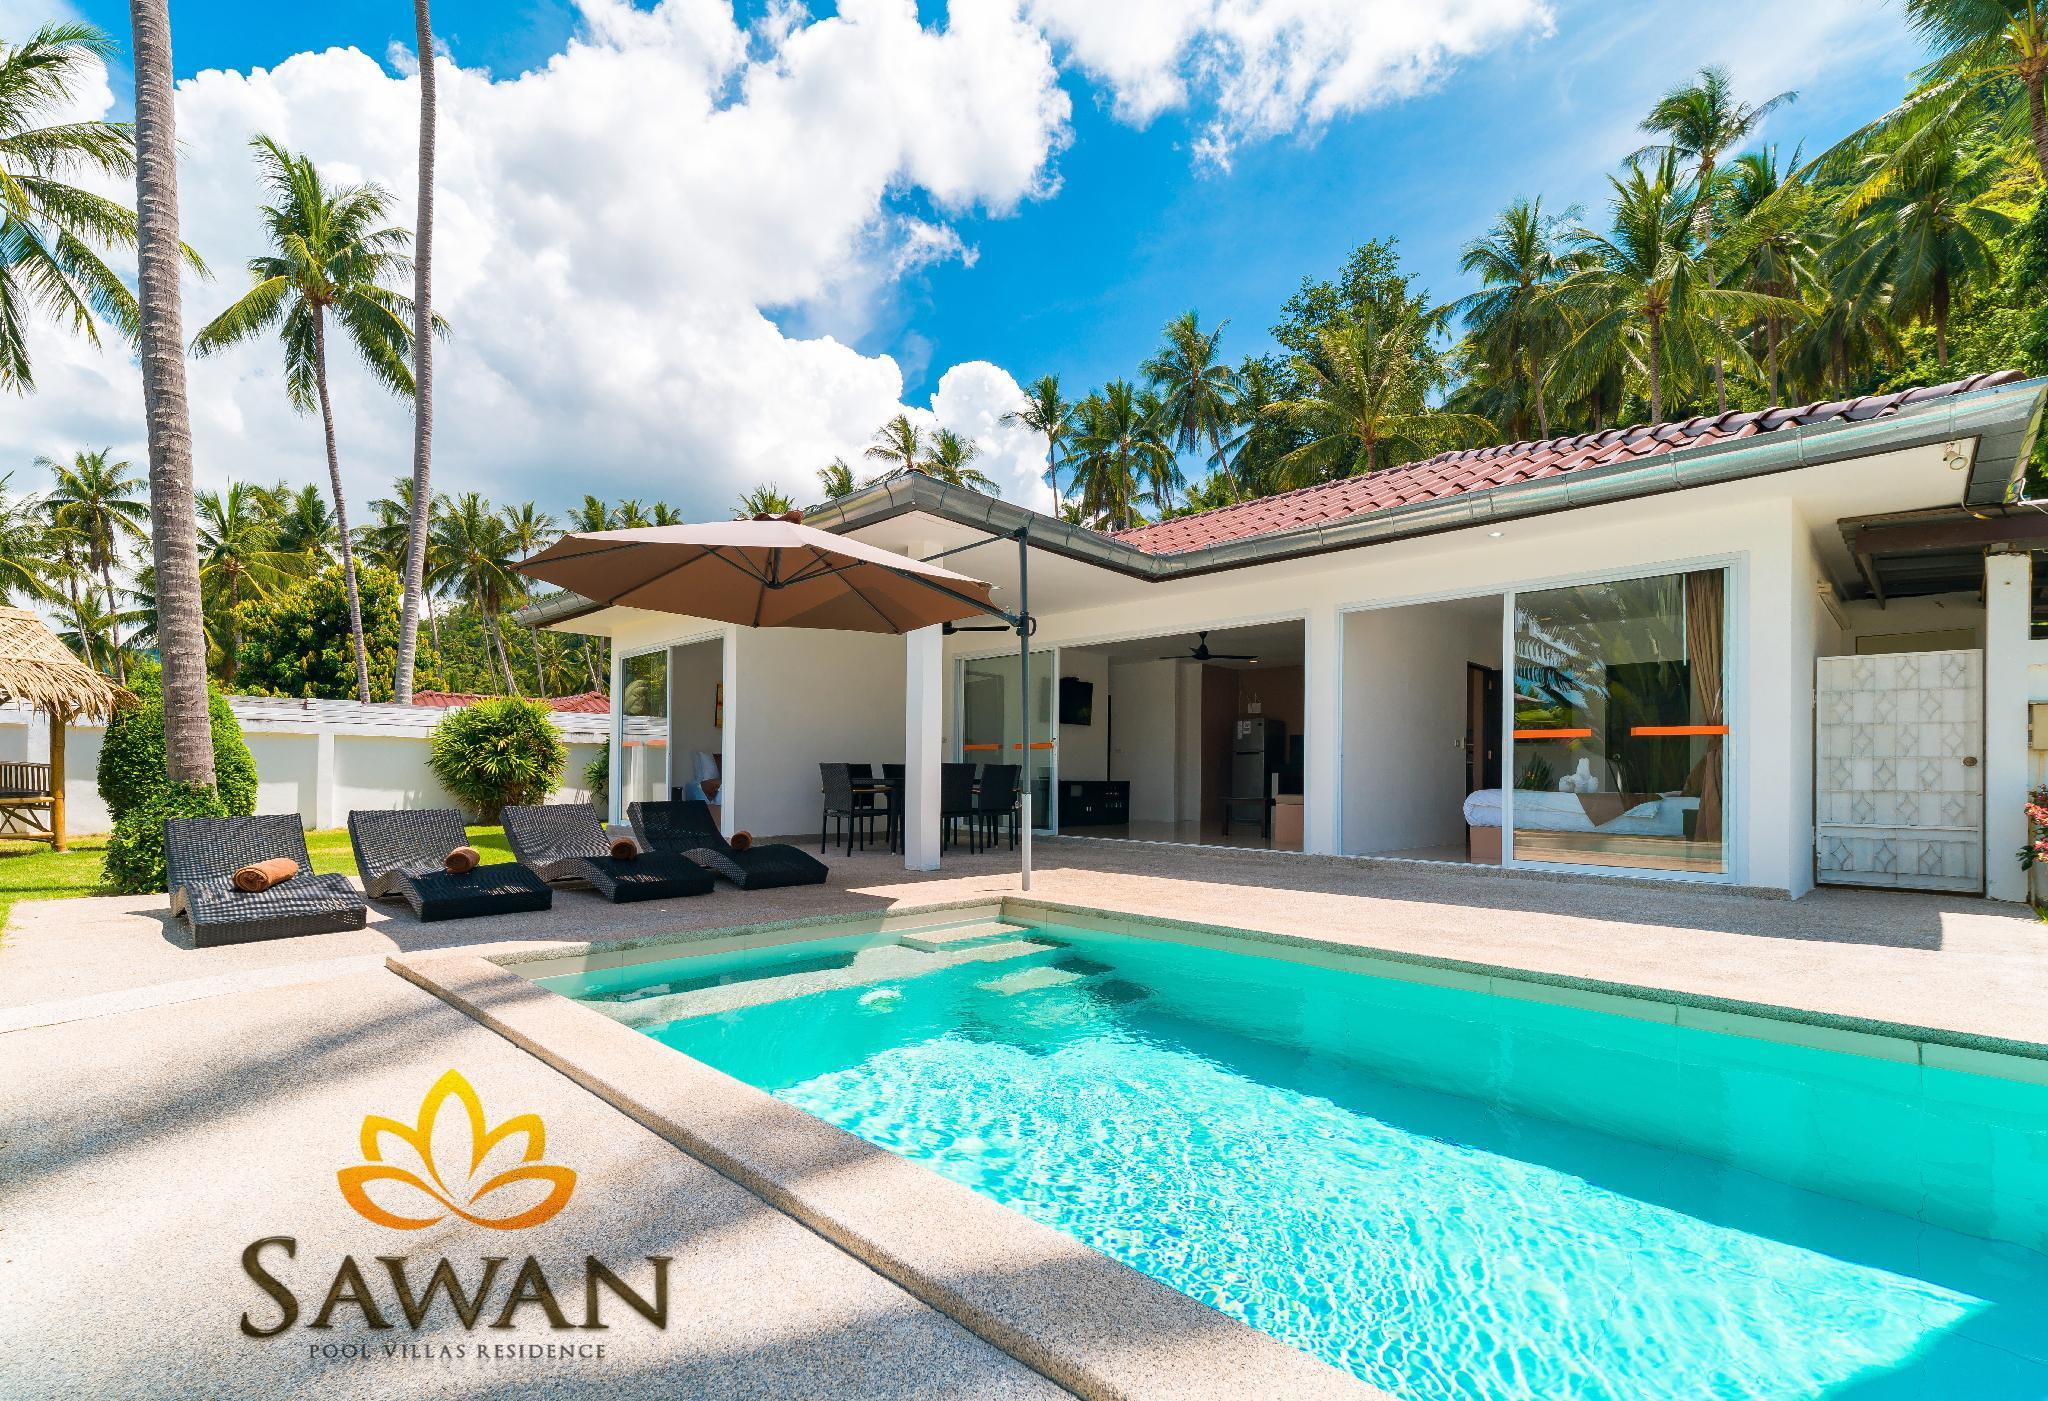 SAWAN Pool Villas residence - 2 beds Pool Villa วิลลา 2 ห้องนอน 3 ห้องน้ำส่วนตัว ขนาด 85 ตร.ม. – หาดละไม